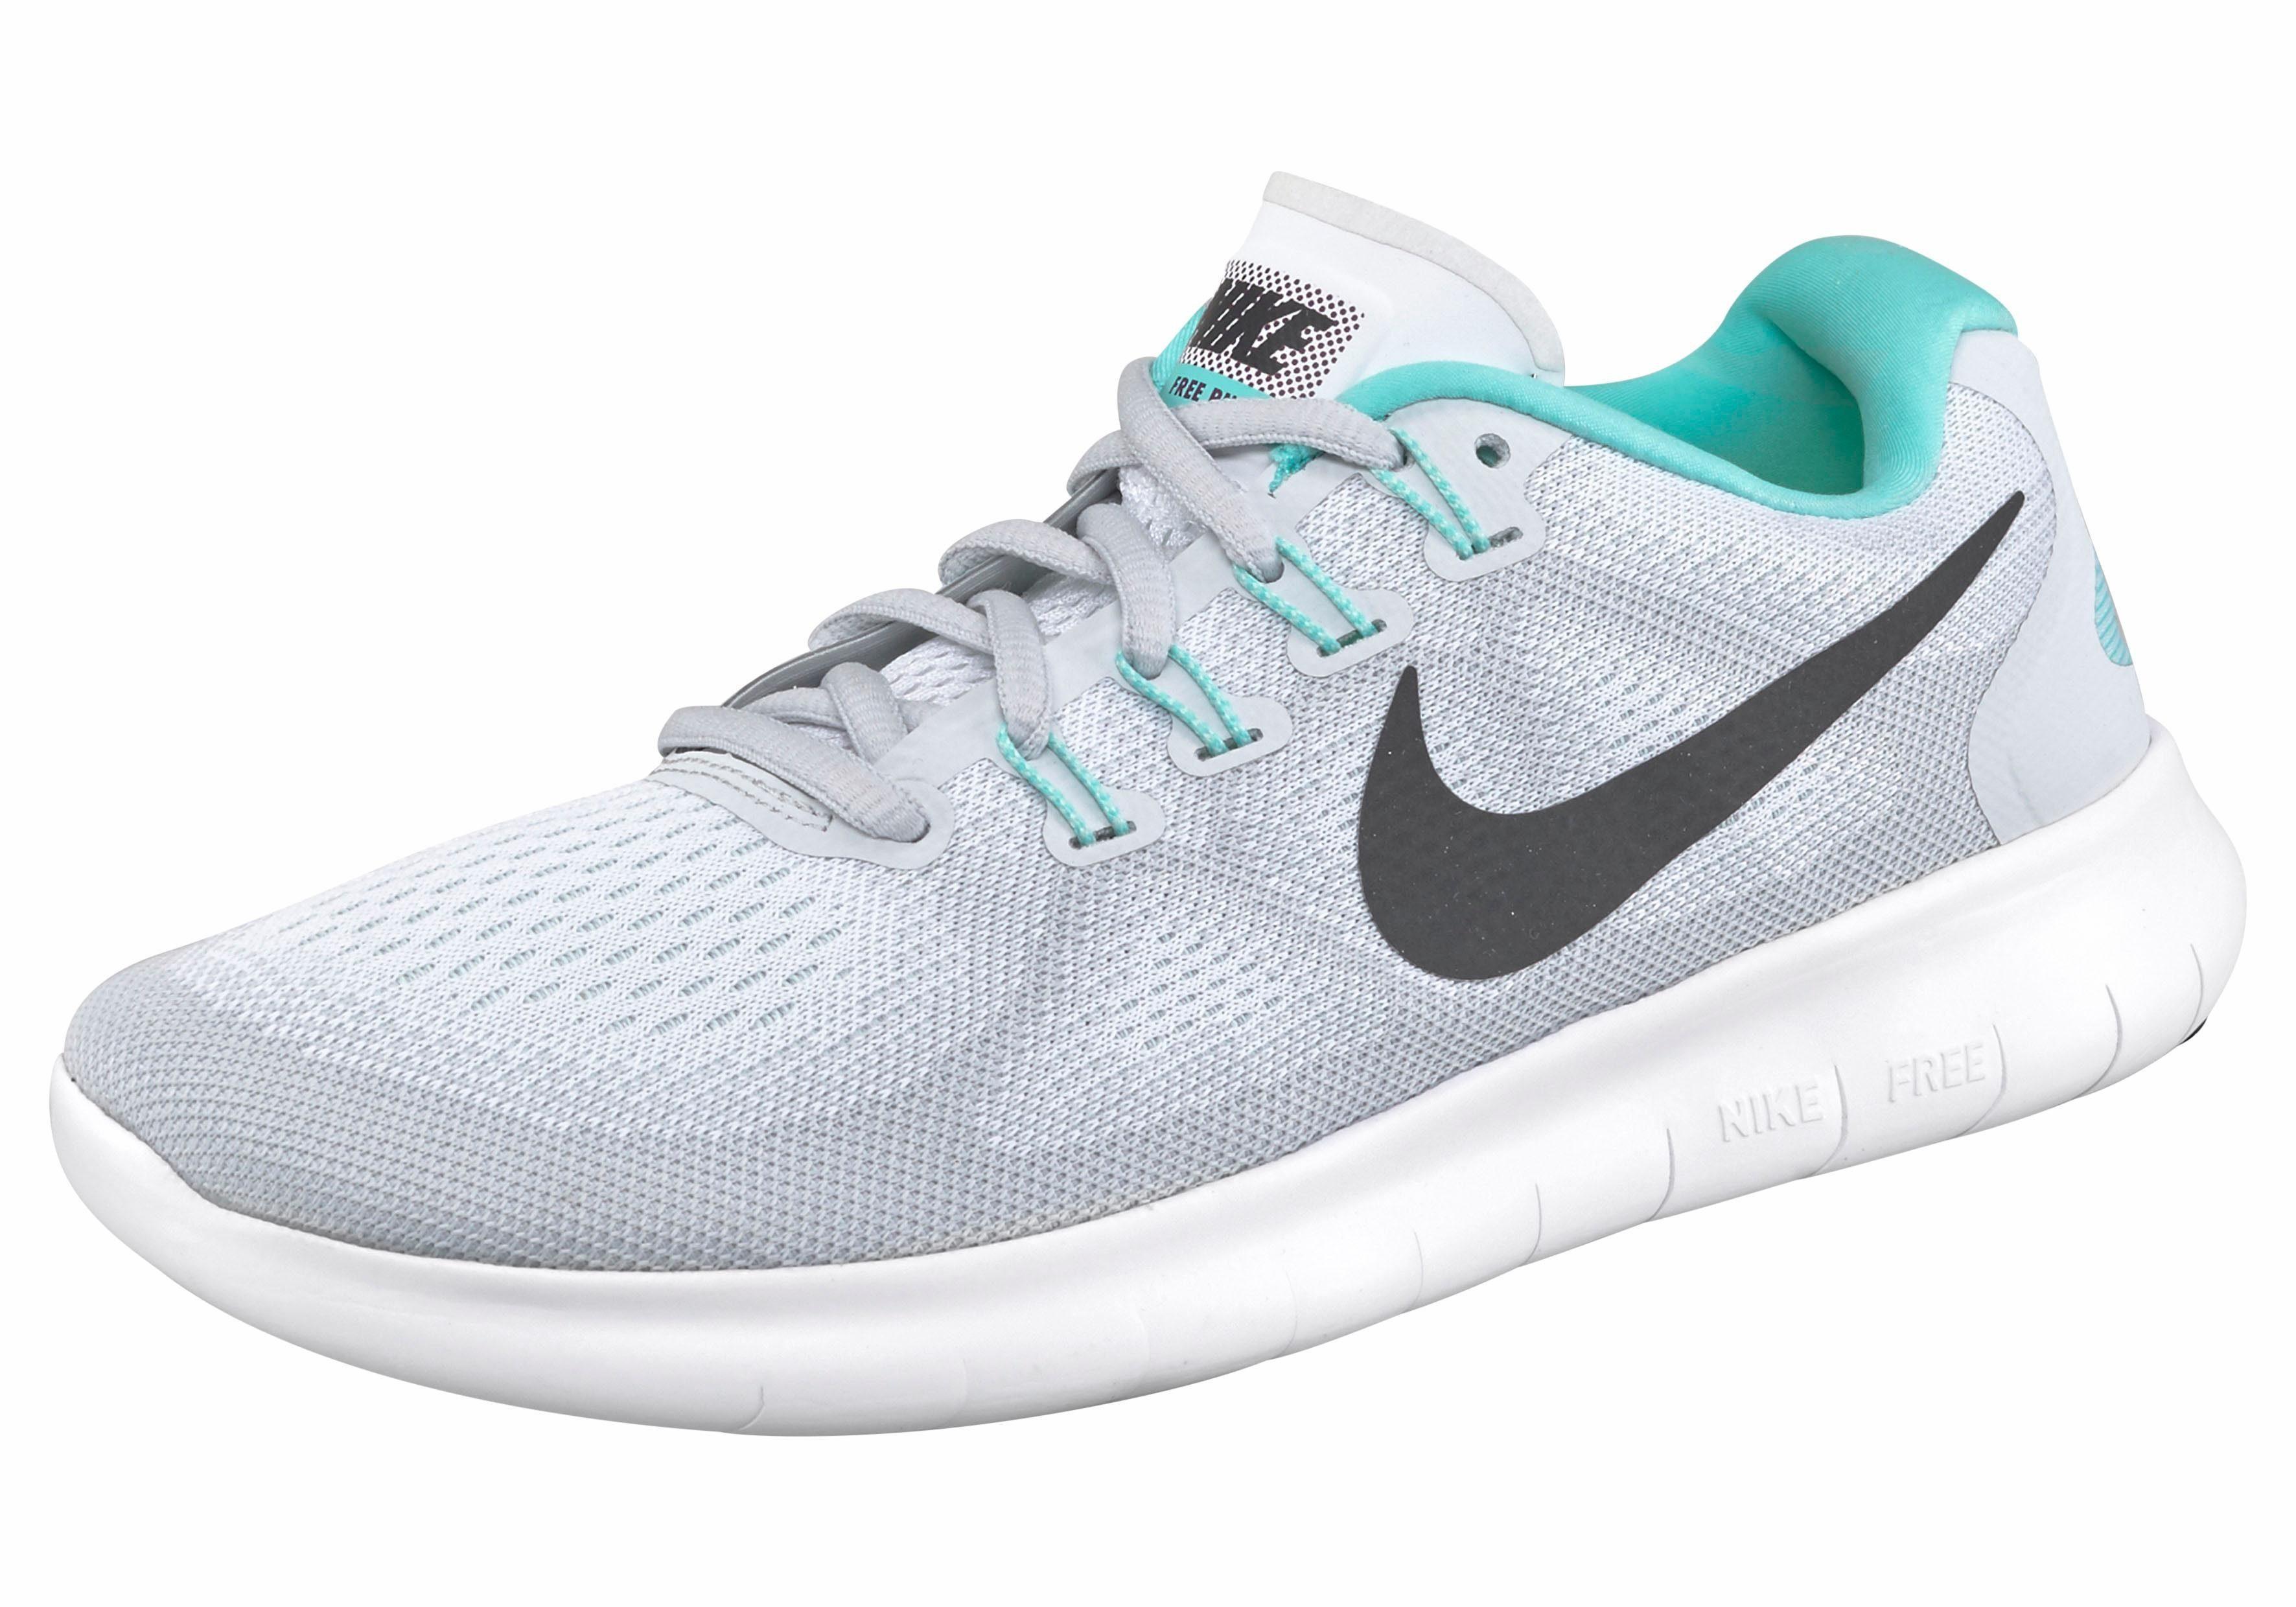 Nike »Wmns Free Run 2« Laufschuh, natur, sand